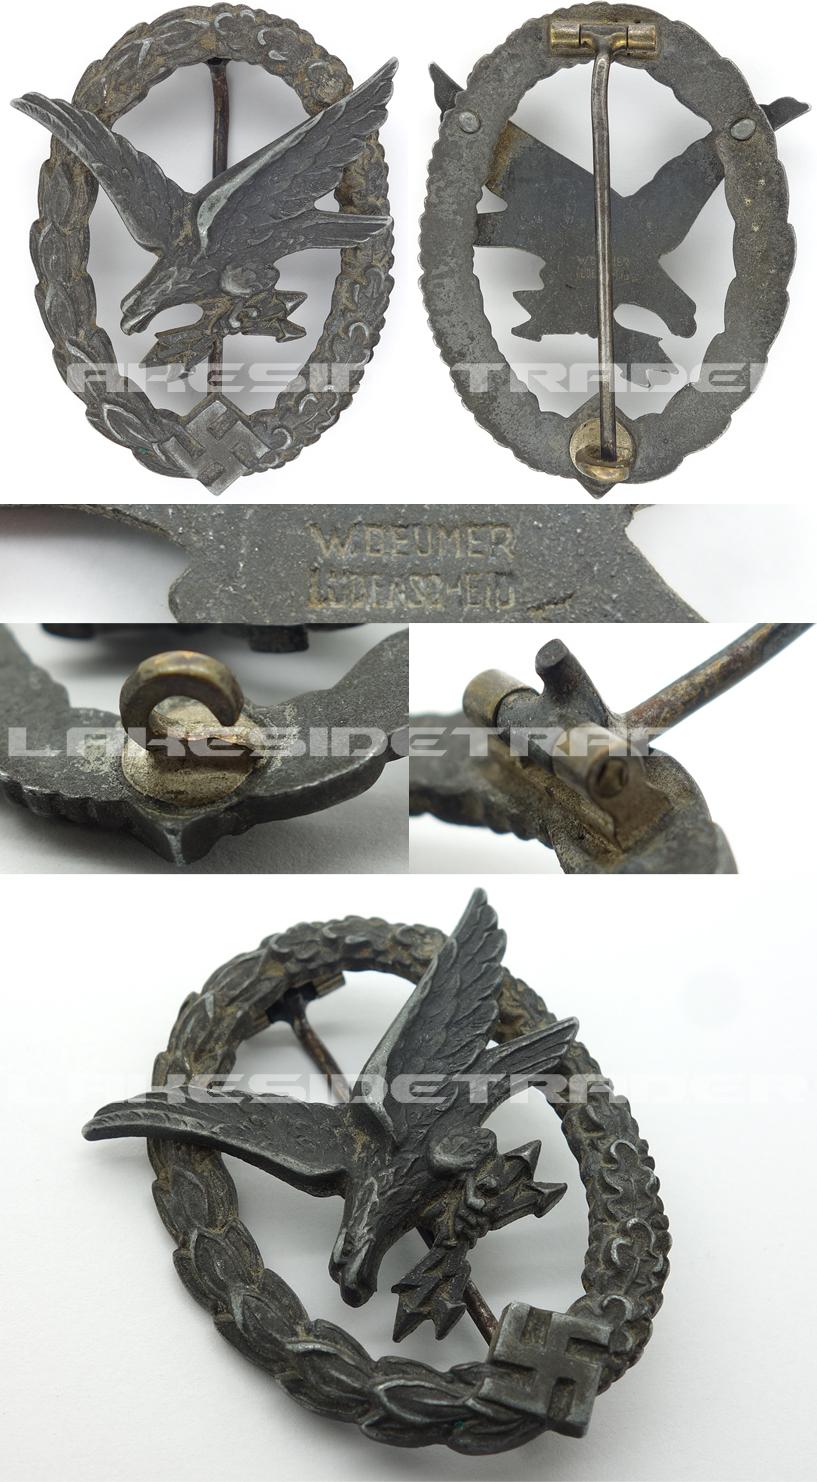 Radio Operation/Air Gunner Badge by W. Deumer